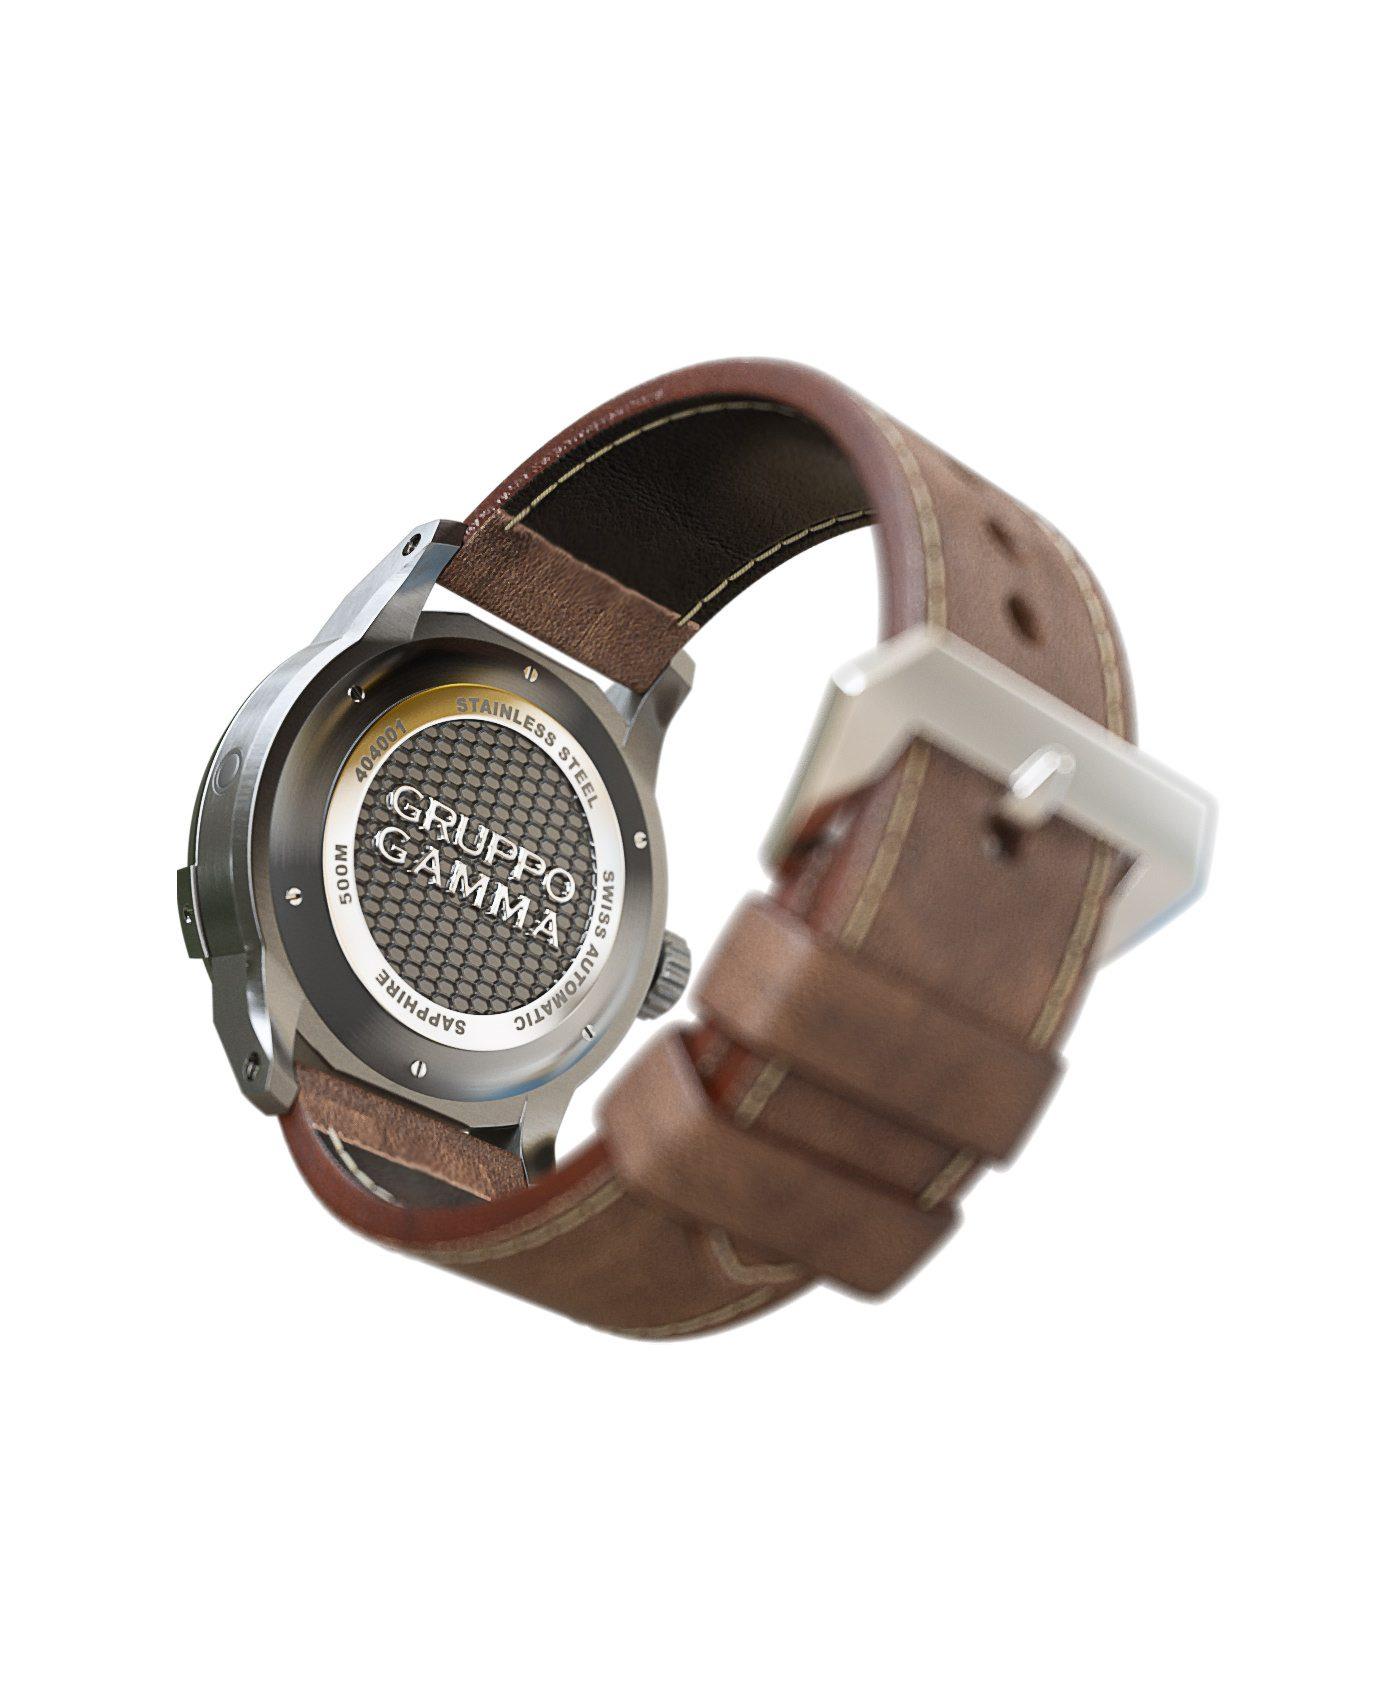 WatchBandit Gruppo Gamma - Divemaster - DG-05 Vintage Lume back